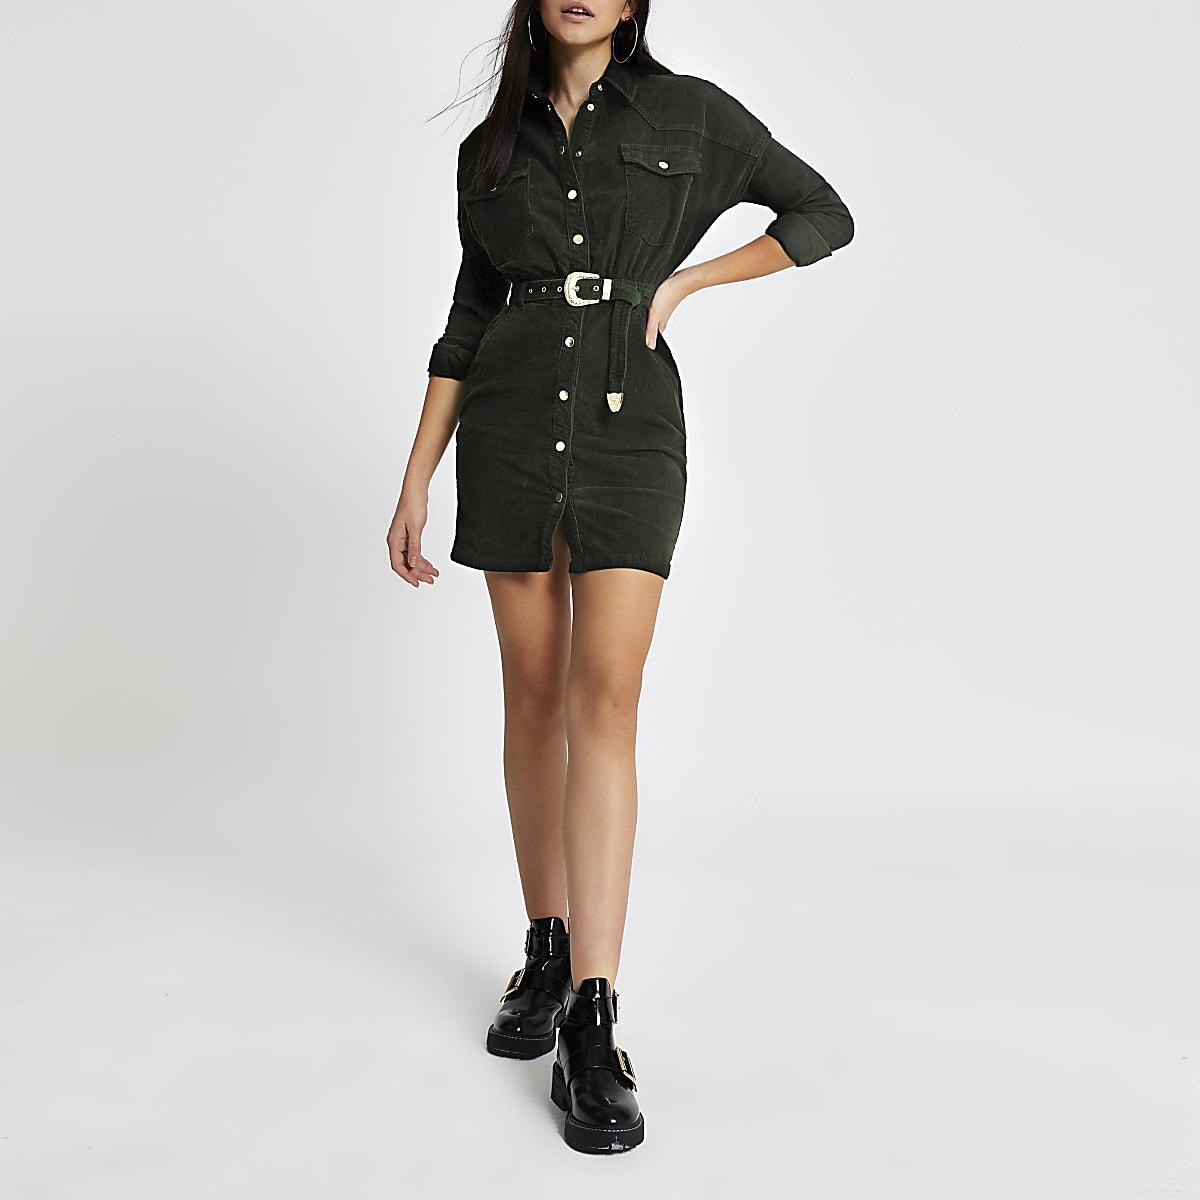 Dark green corduroy belted shirt dress